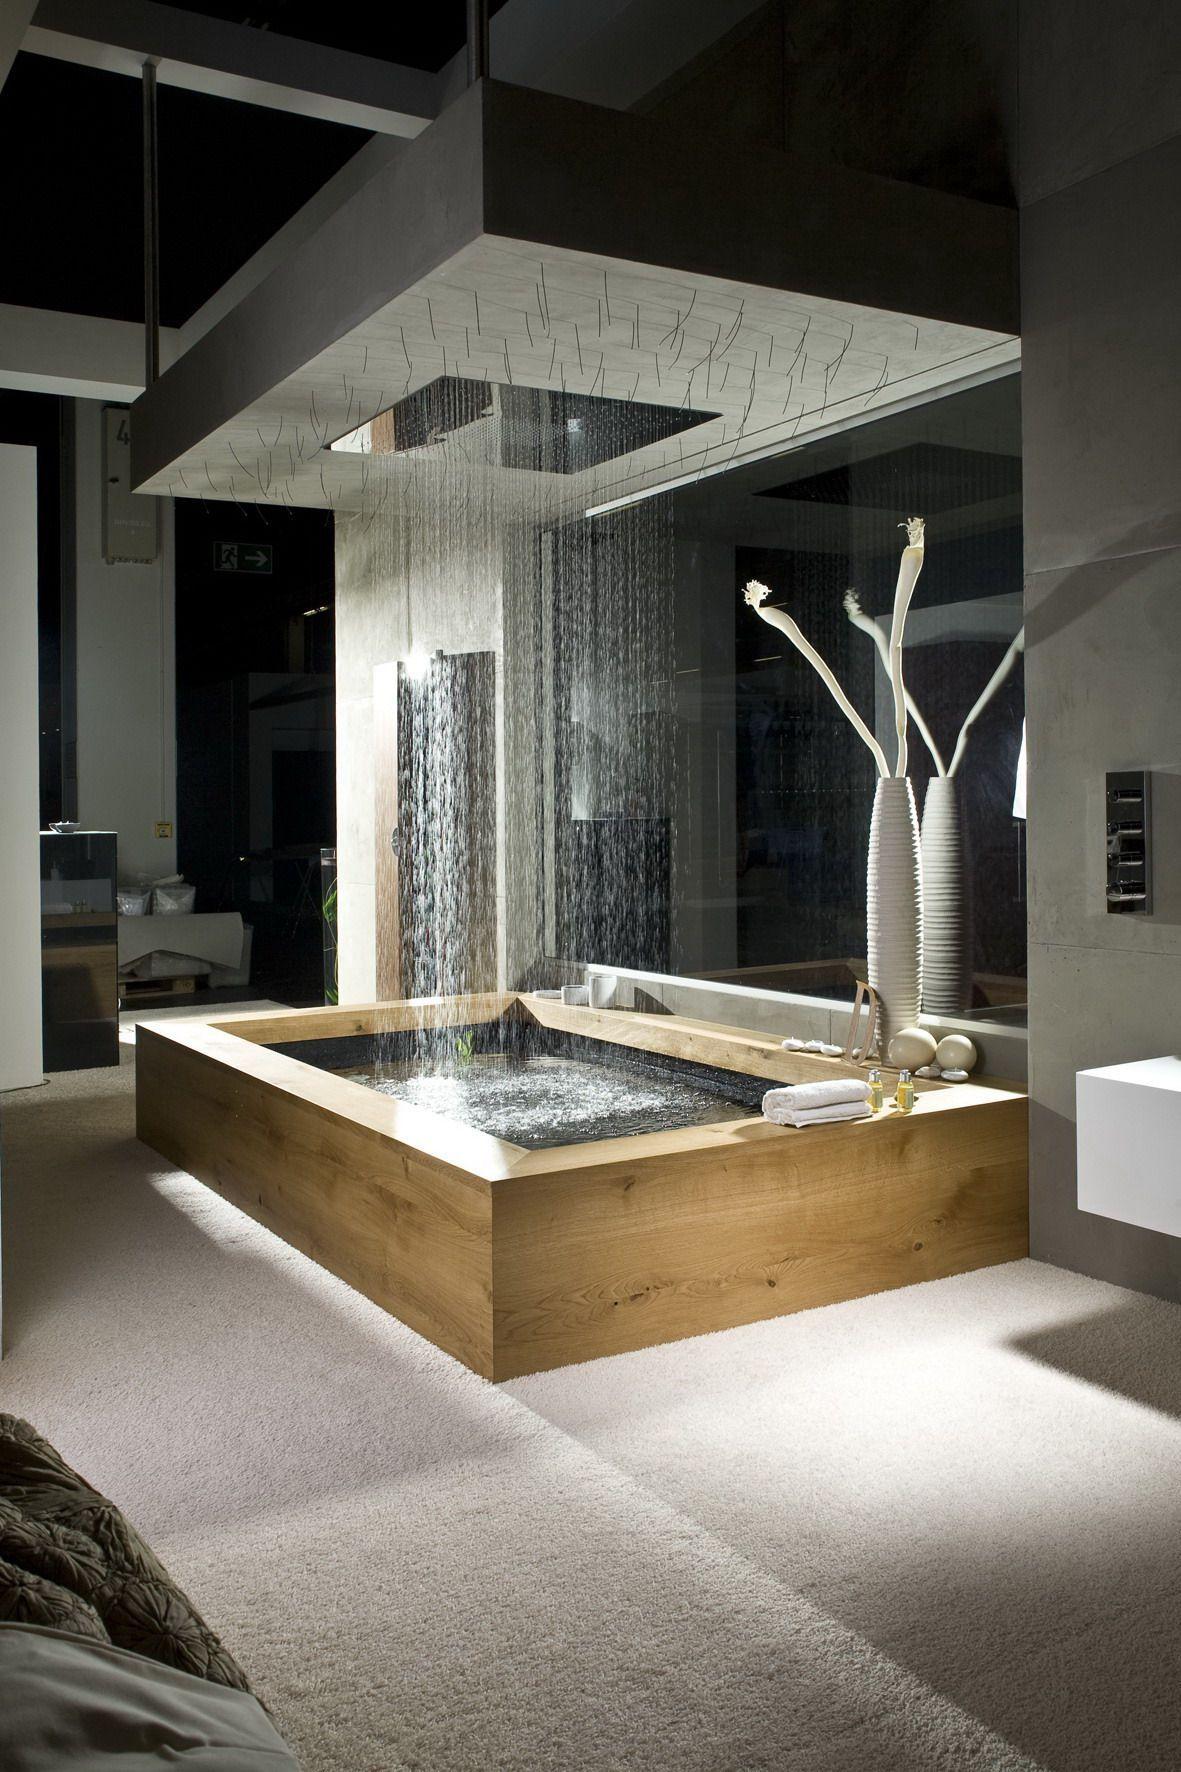 Top 11 Modern Bathroom Design to 11 in 11  Luxus badezimmer